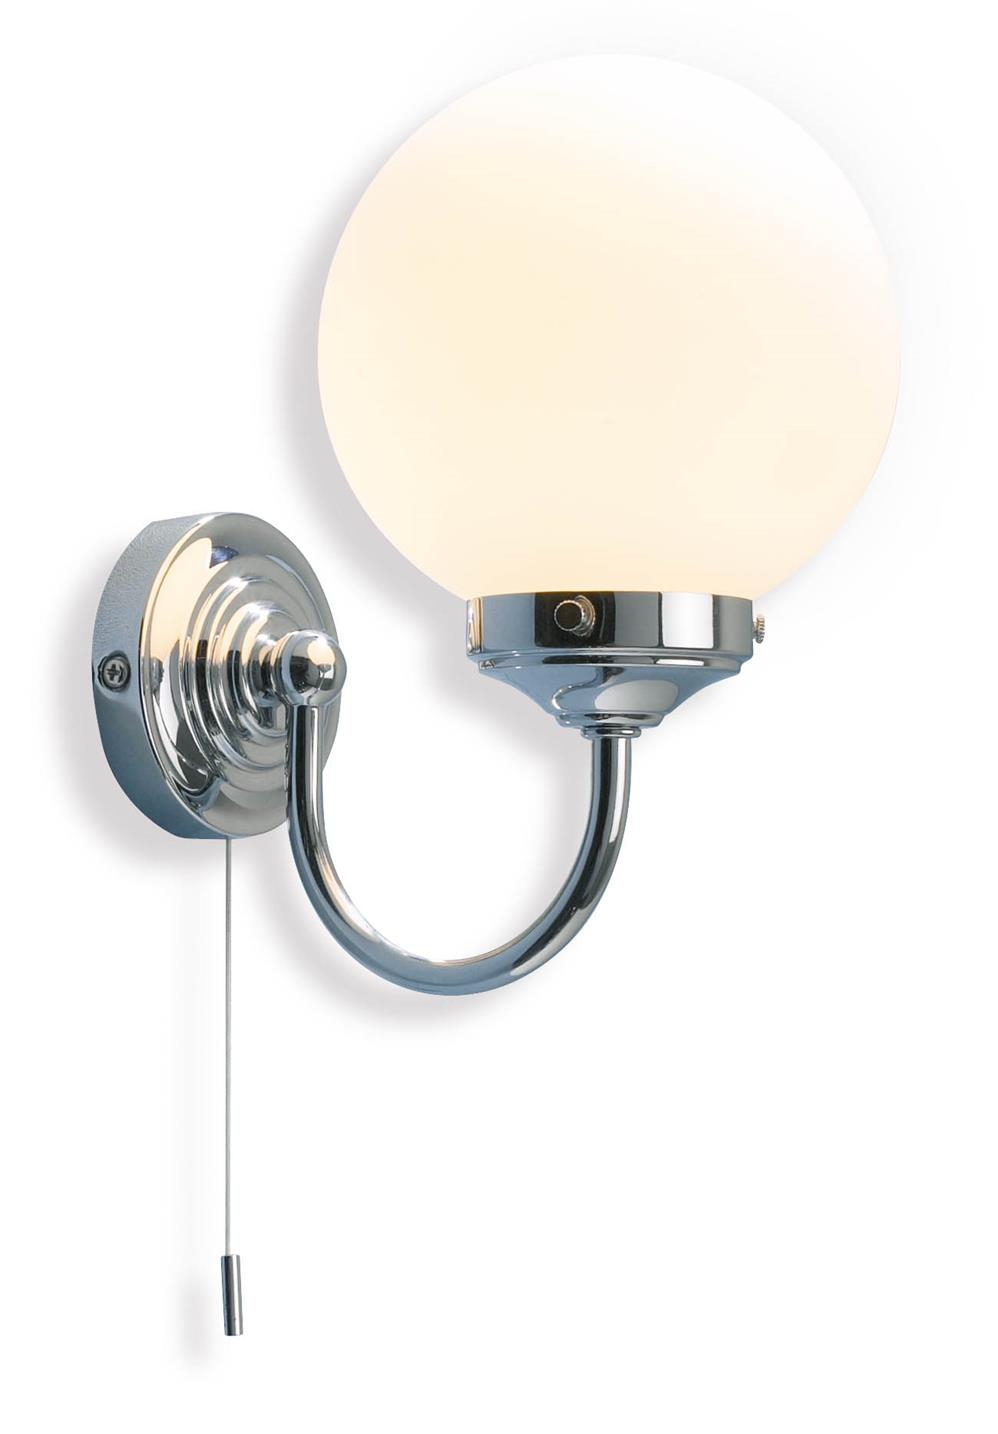 Bathroom Wall Lamp: BAR0750 Barclay Bathroom Wall Light In Chrome